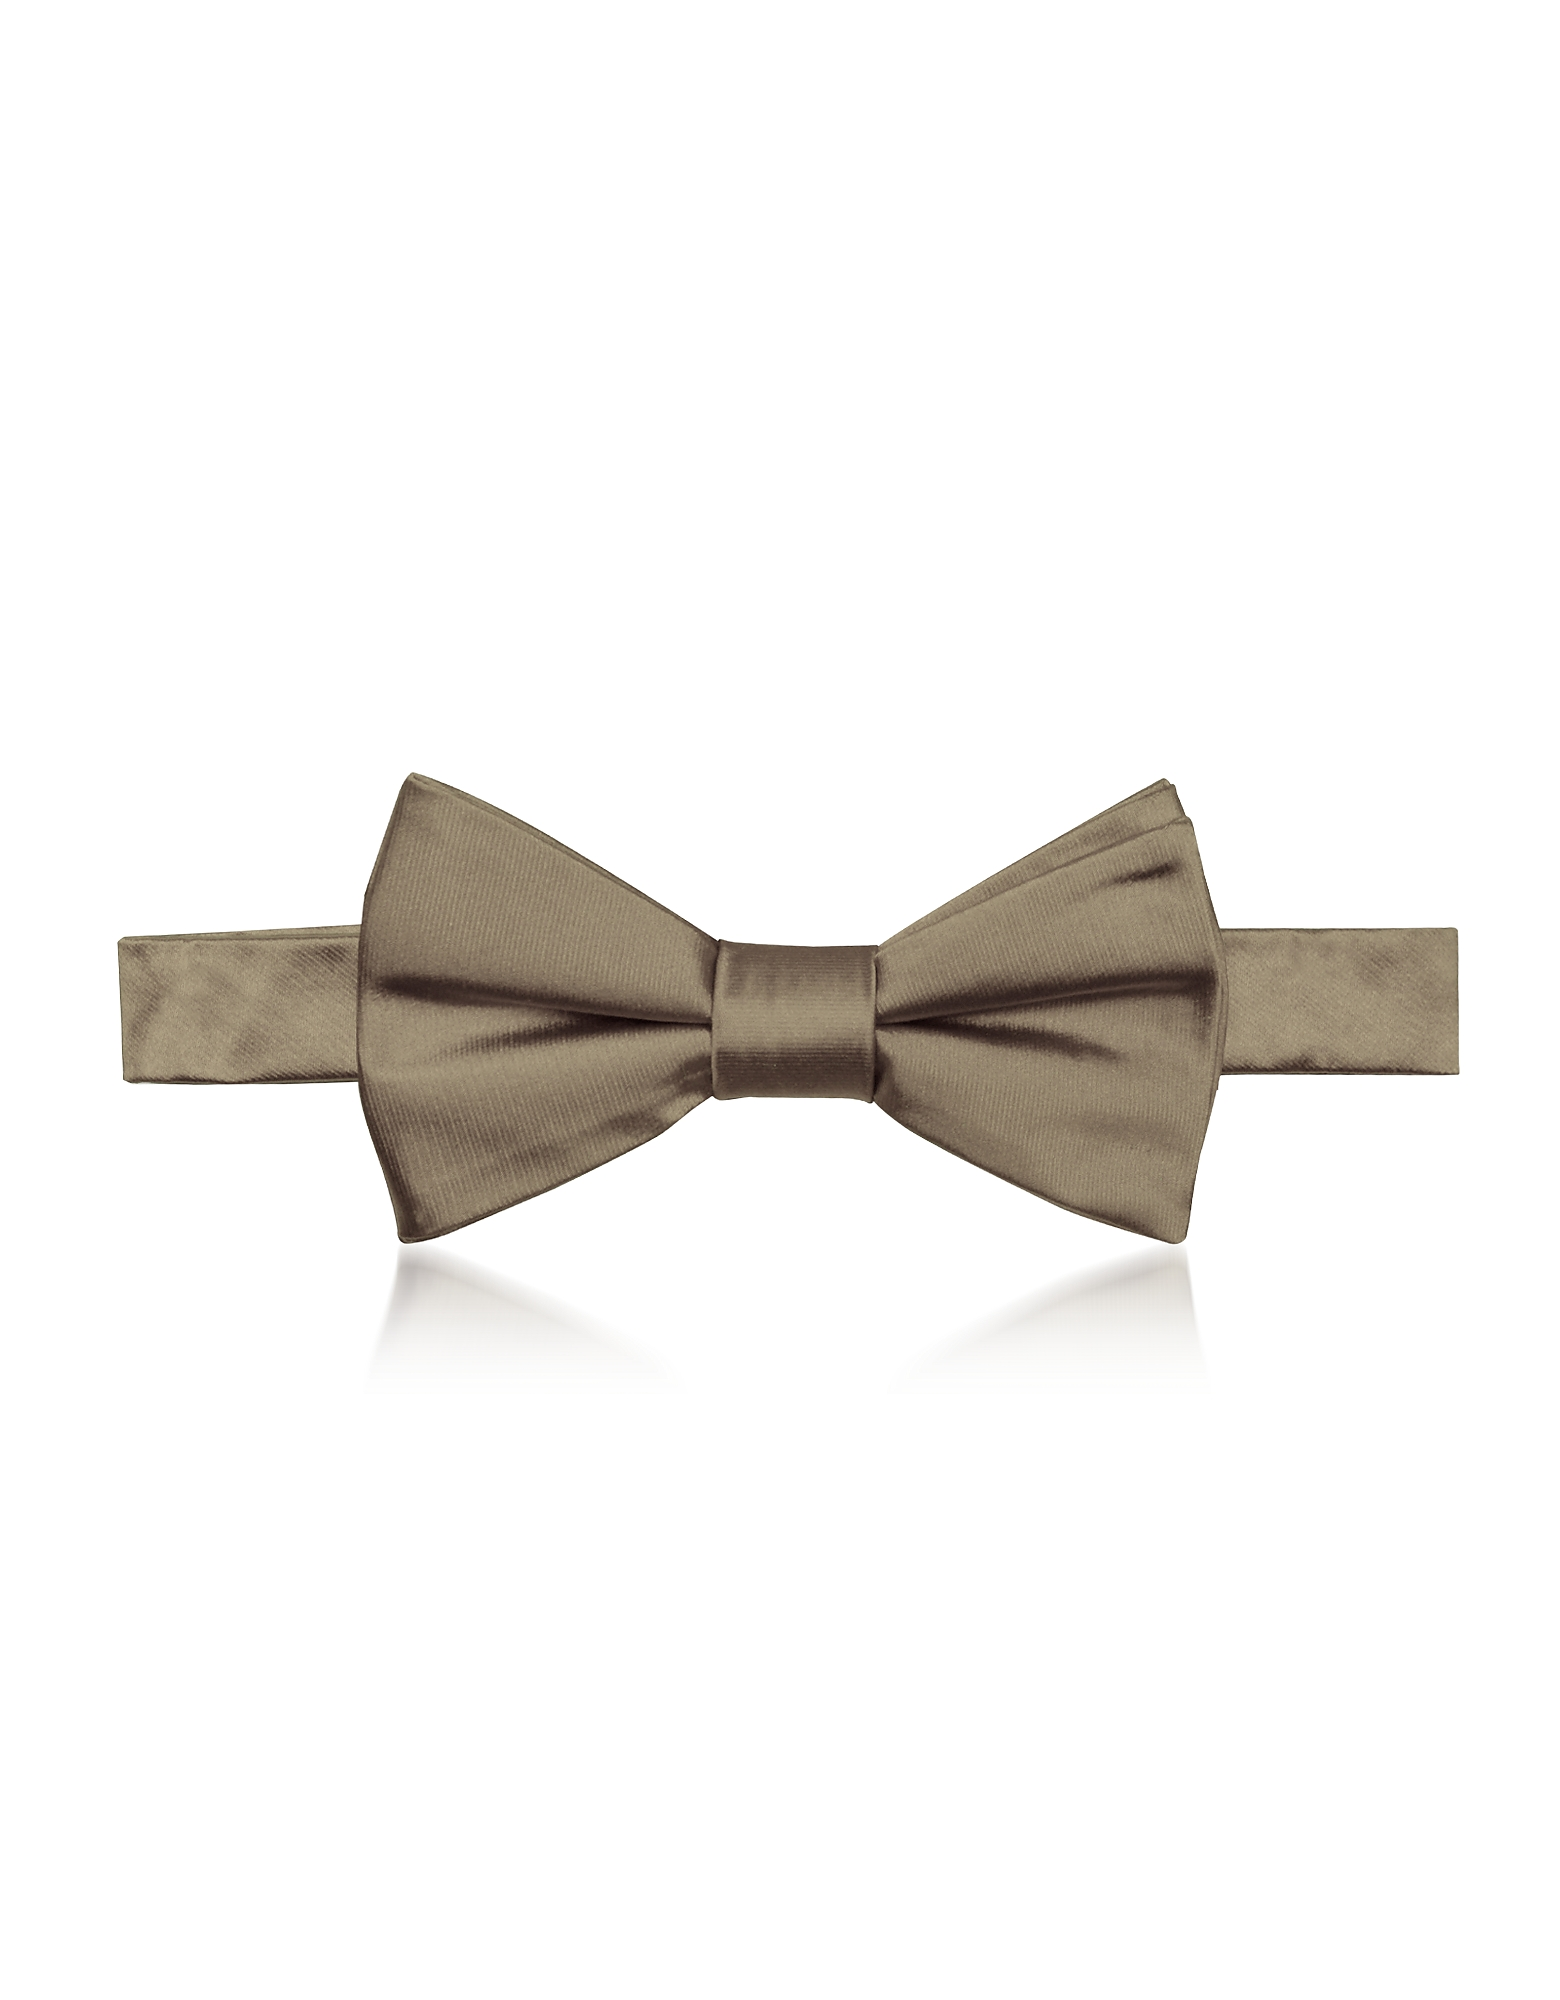 Laura Biagiotti Designer Bowties and Cummerbunds, Bronze Woven Silk Pre-tied Bow-tie